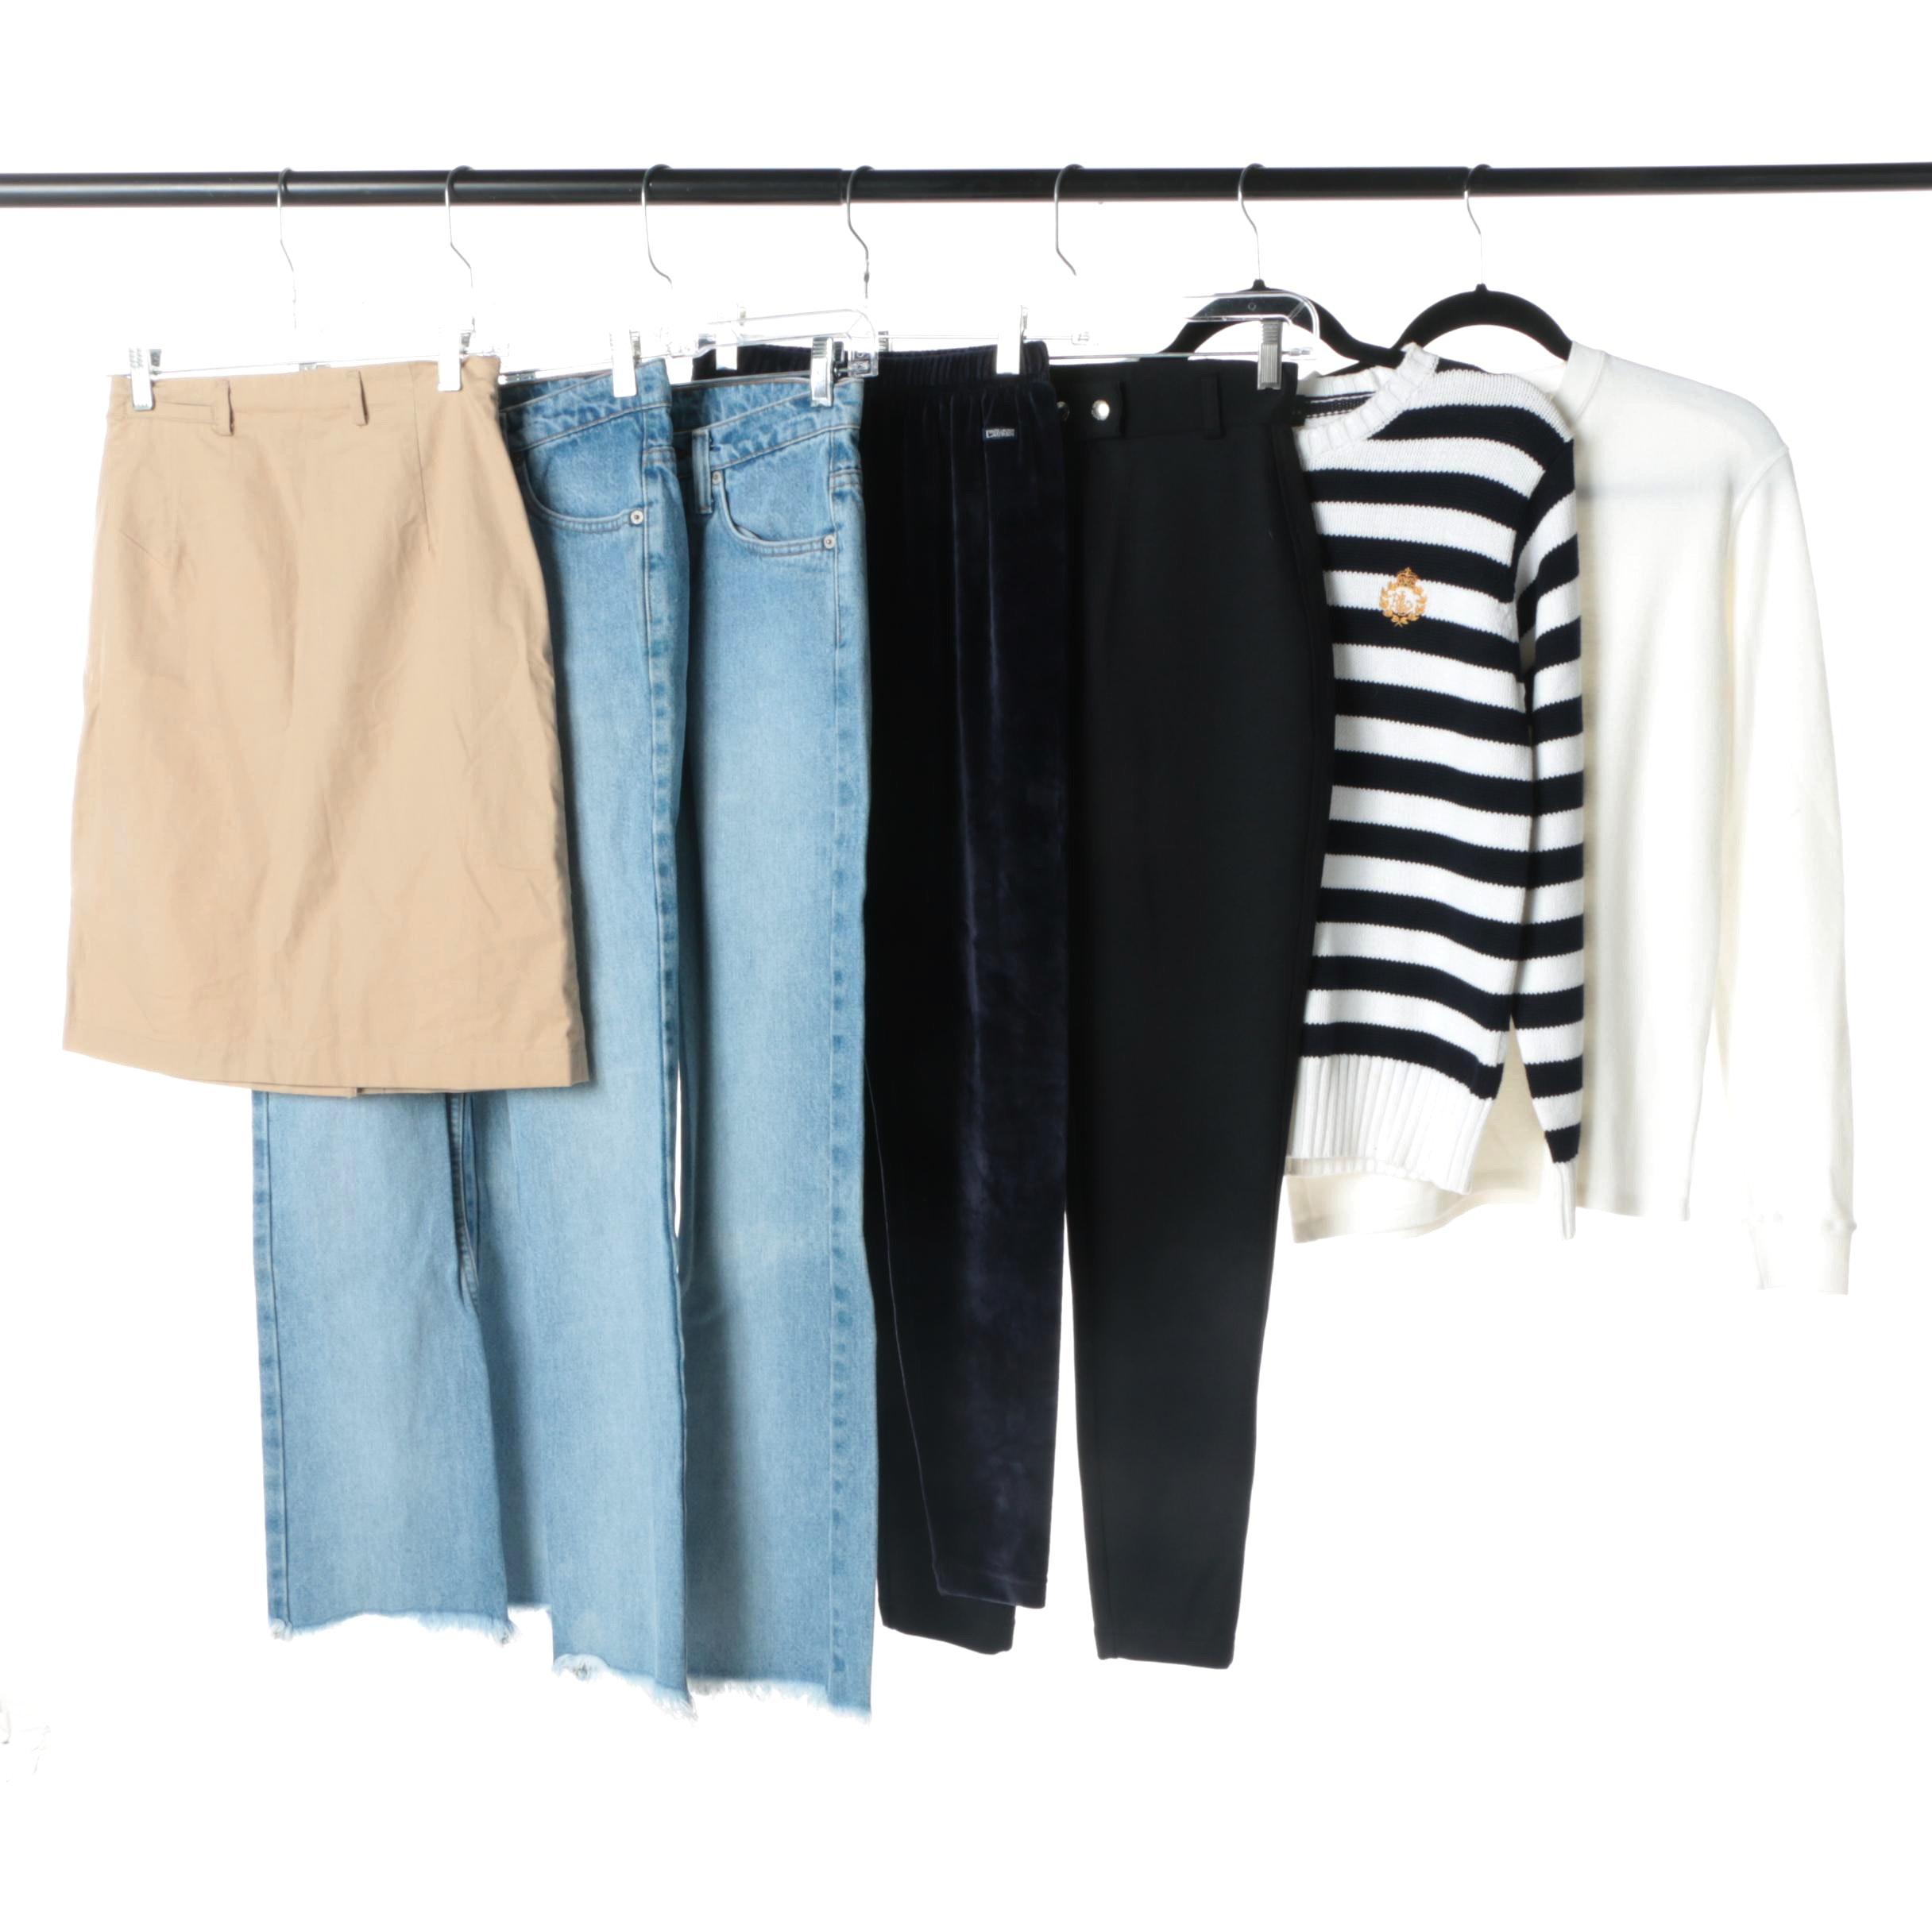 Women's Ralph Lauren Brand Clothing Separates